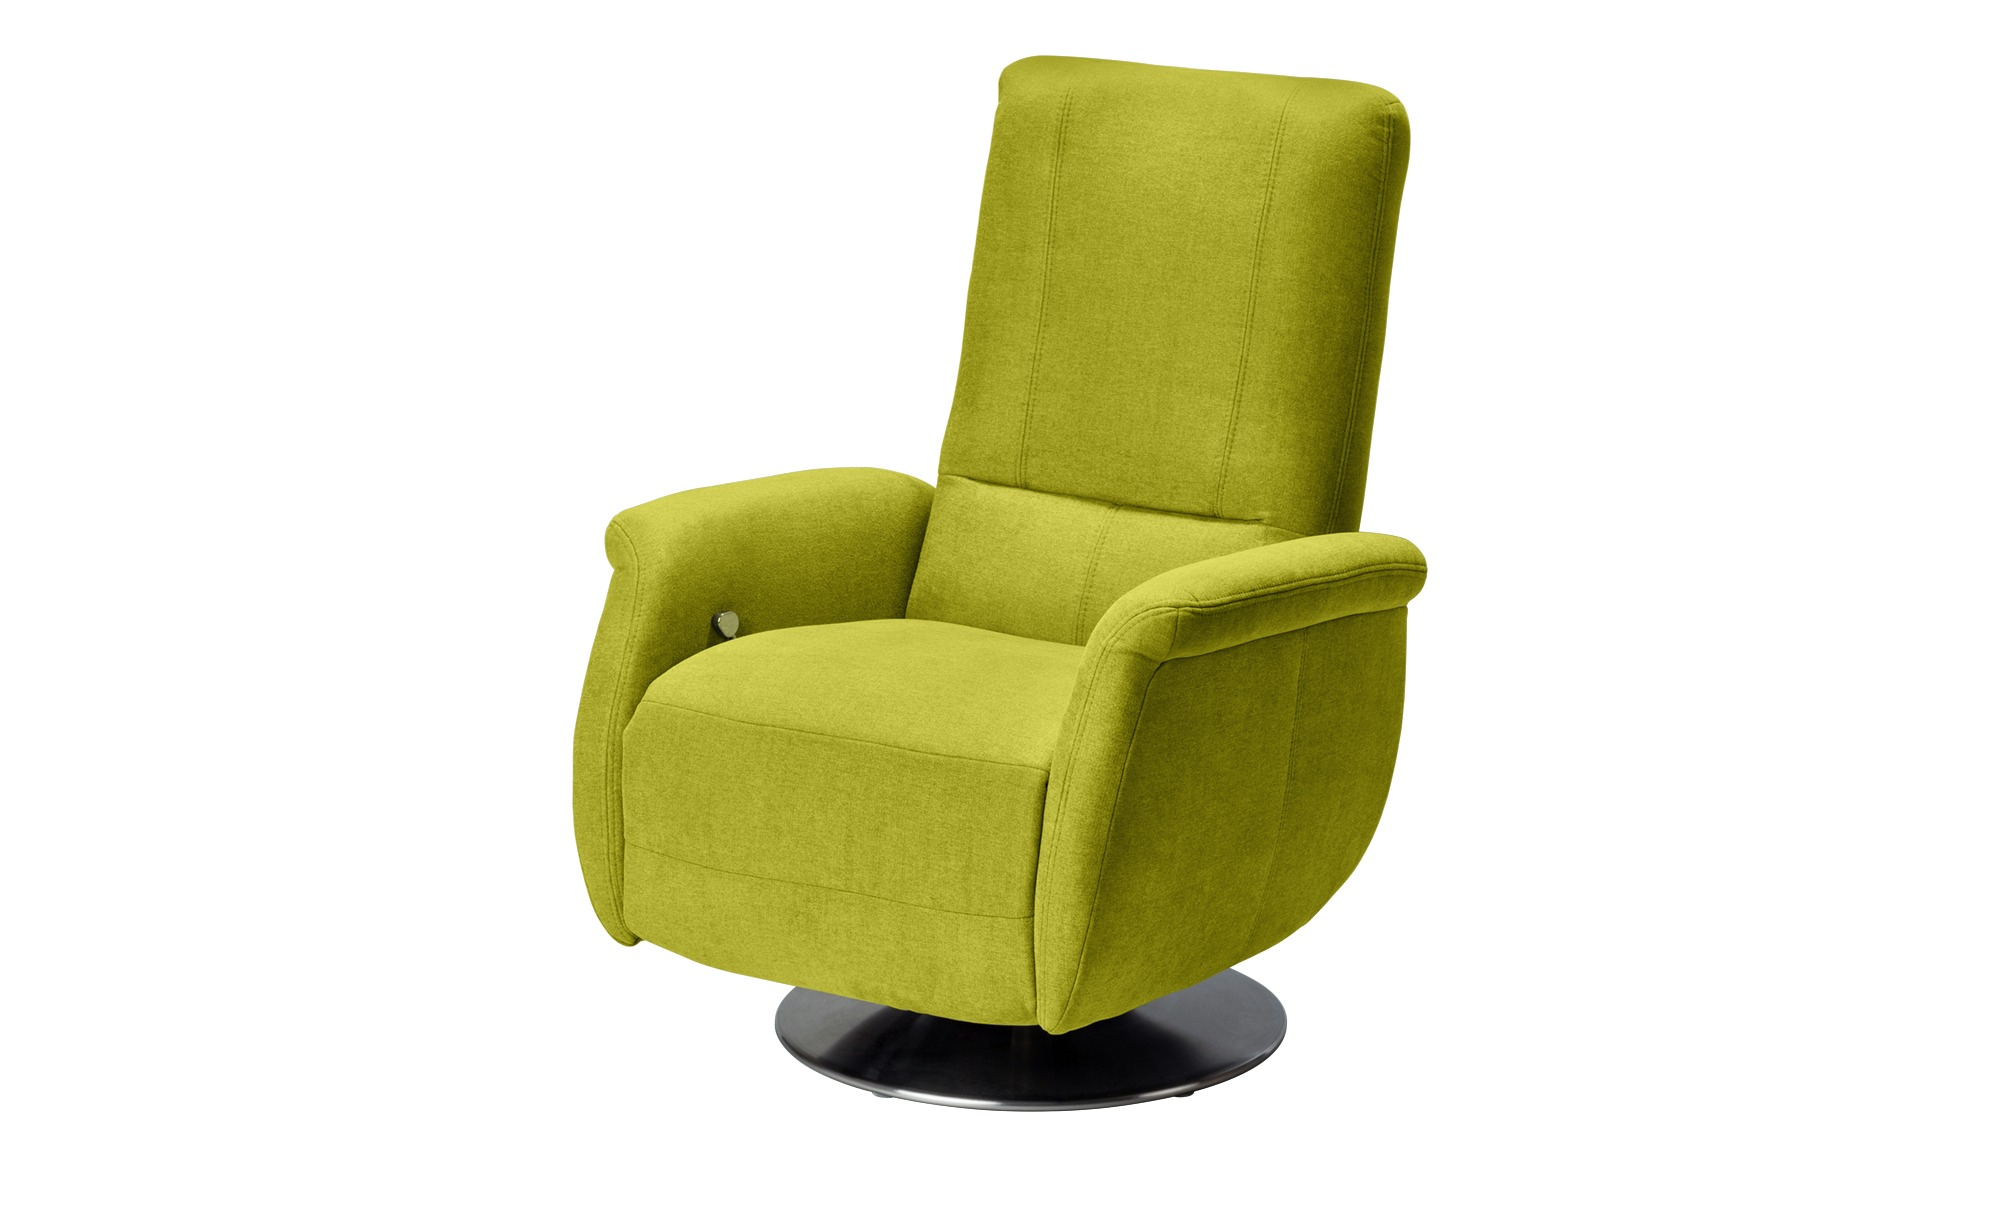 meinSofa Relaxsessel grün - Stoff Felix ¦ grün Polstermöbel > Sessel > Fernsehsessel - Höffner